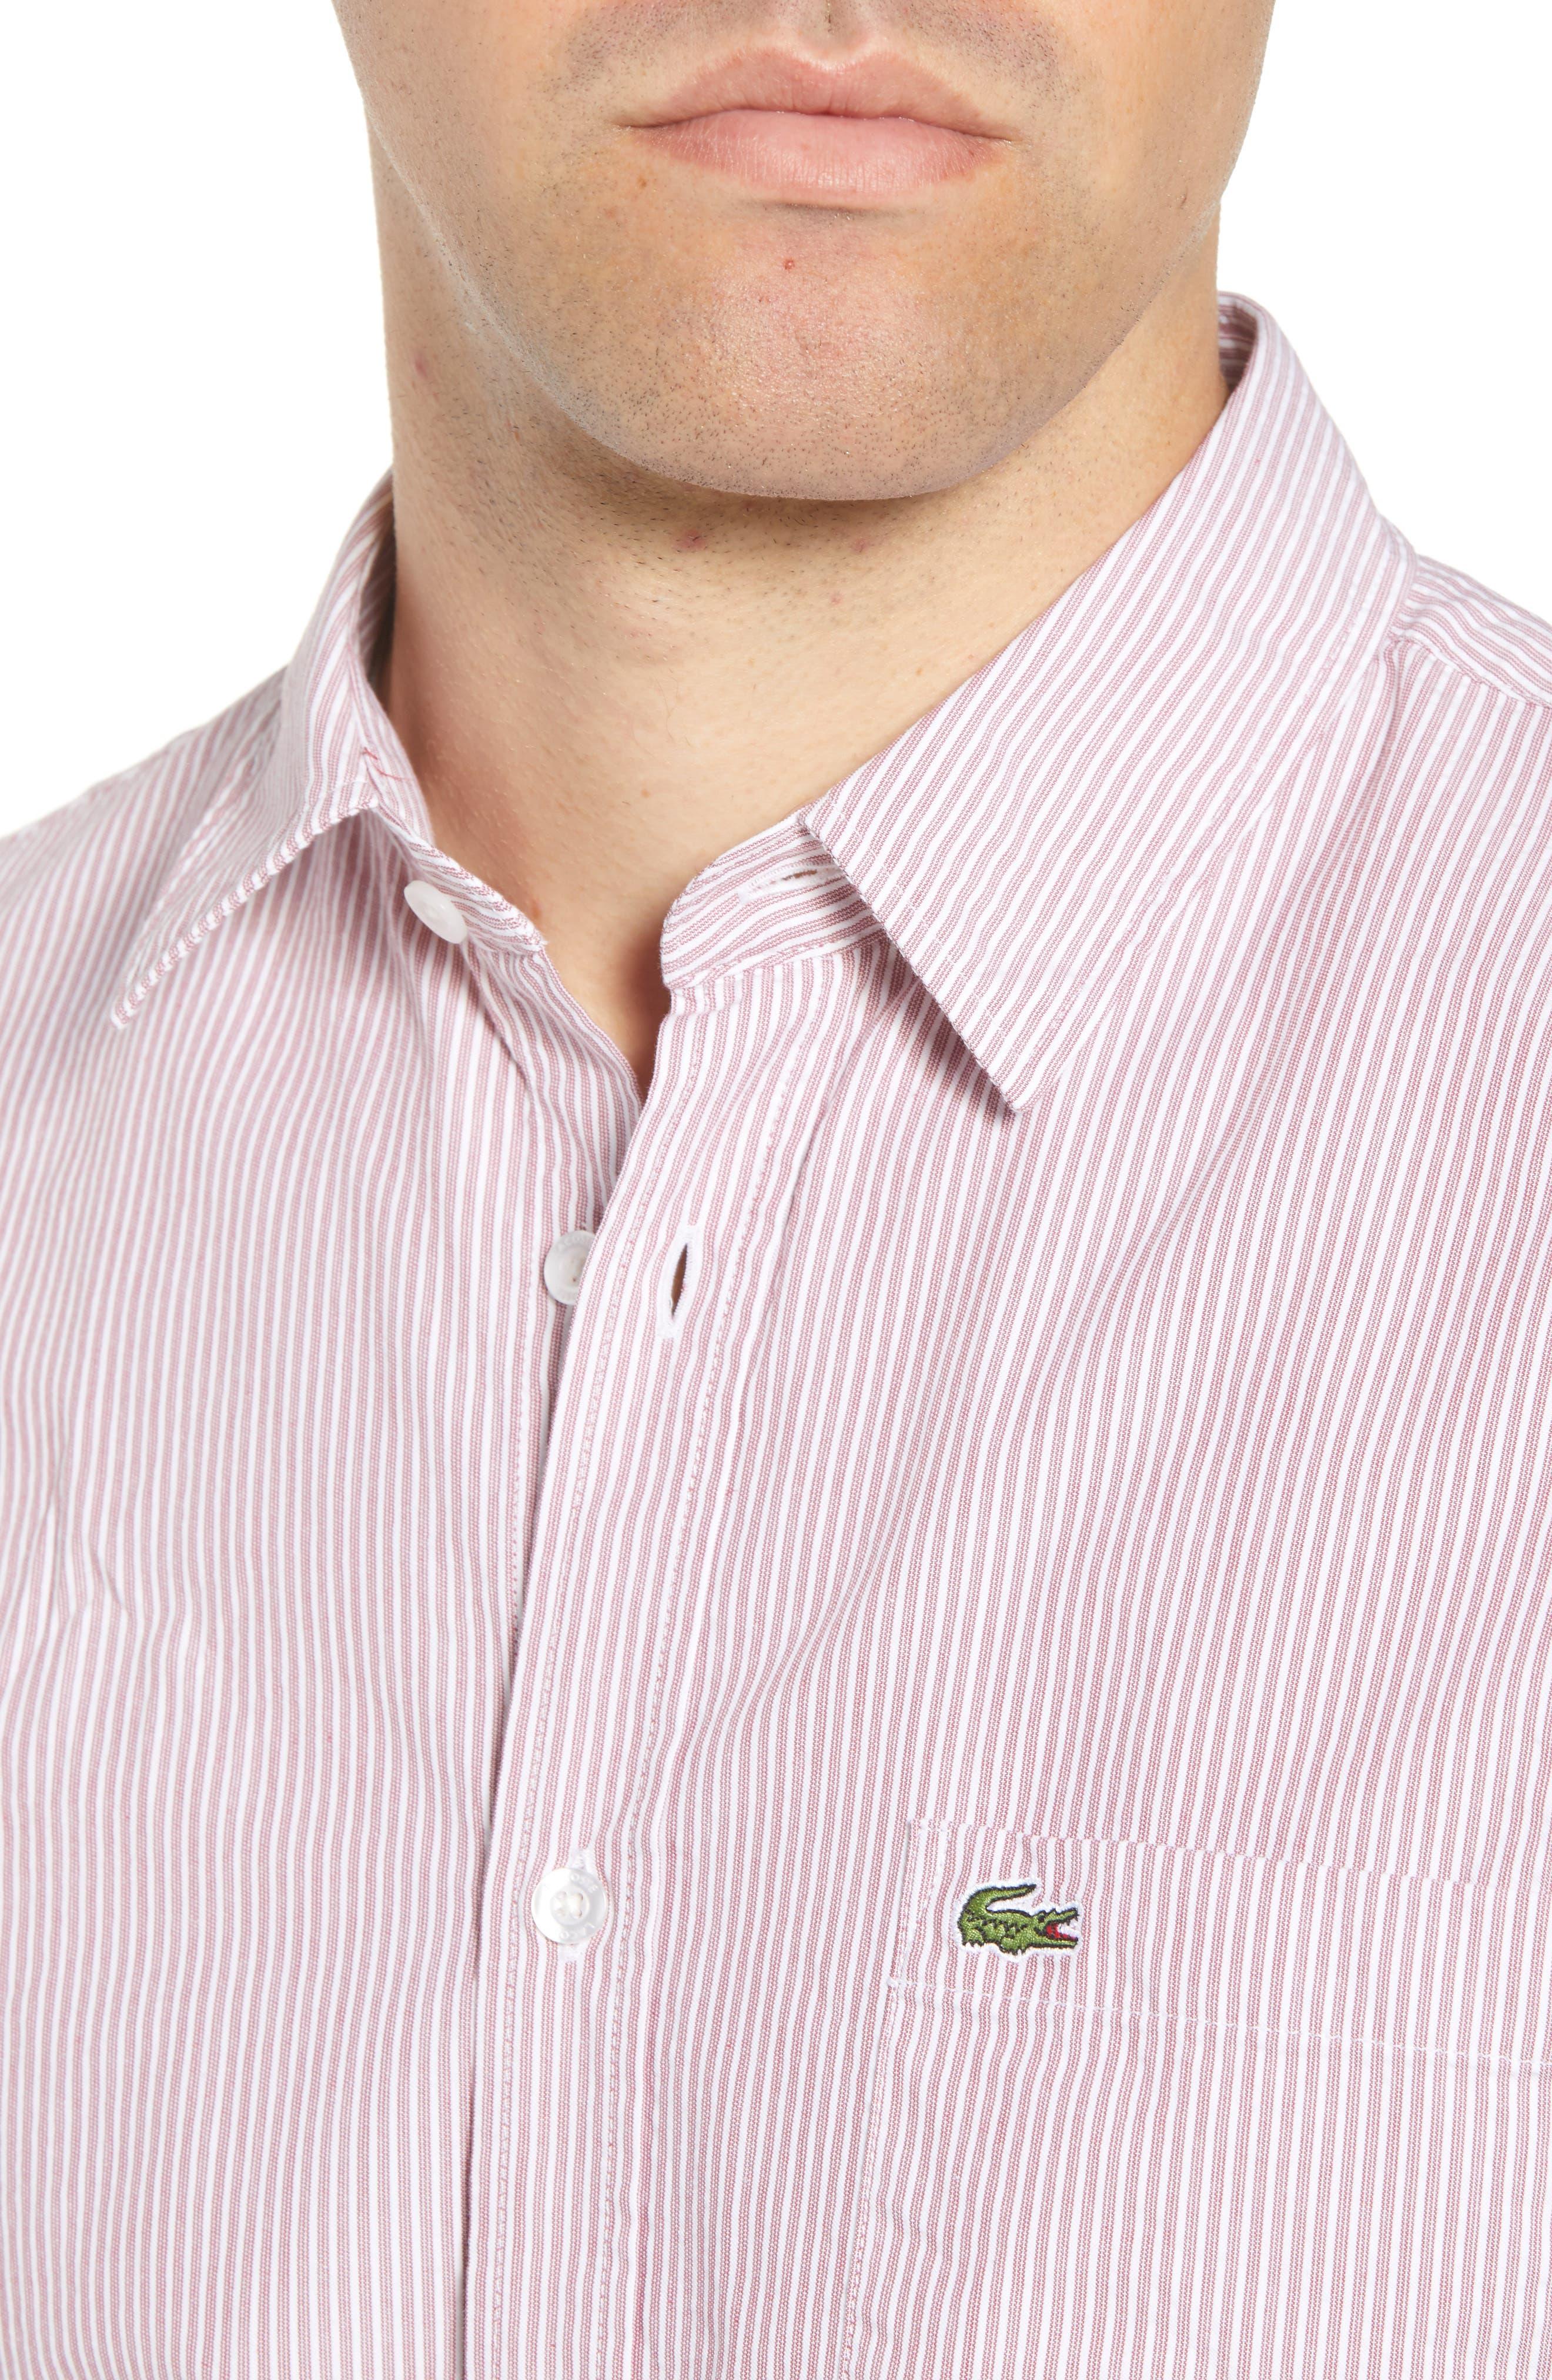 Regular Fit Seersucker Sport Shirt,                             Alternate thumbnail 4, color,                             TOREADOR